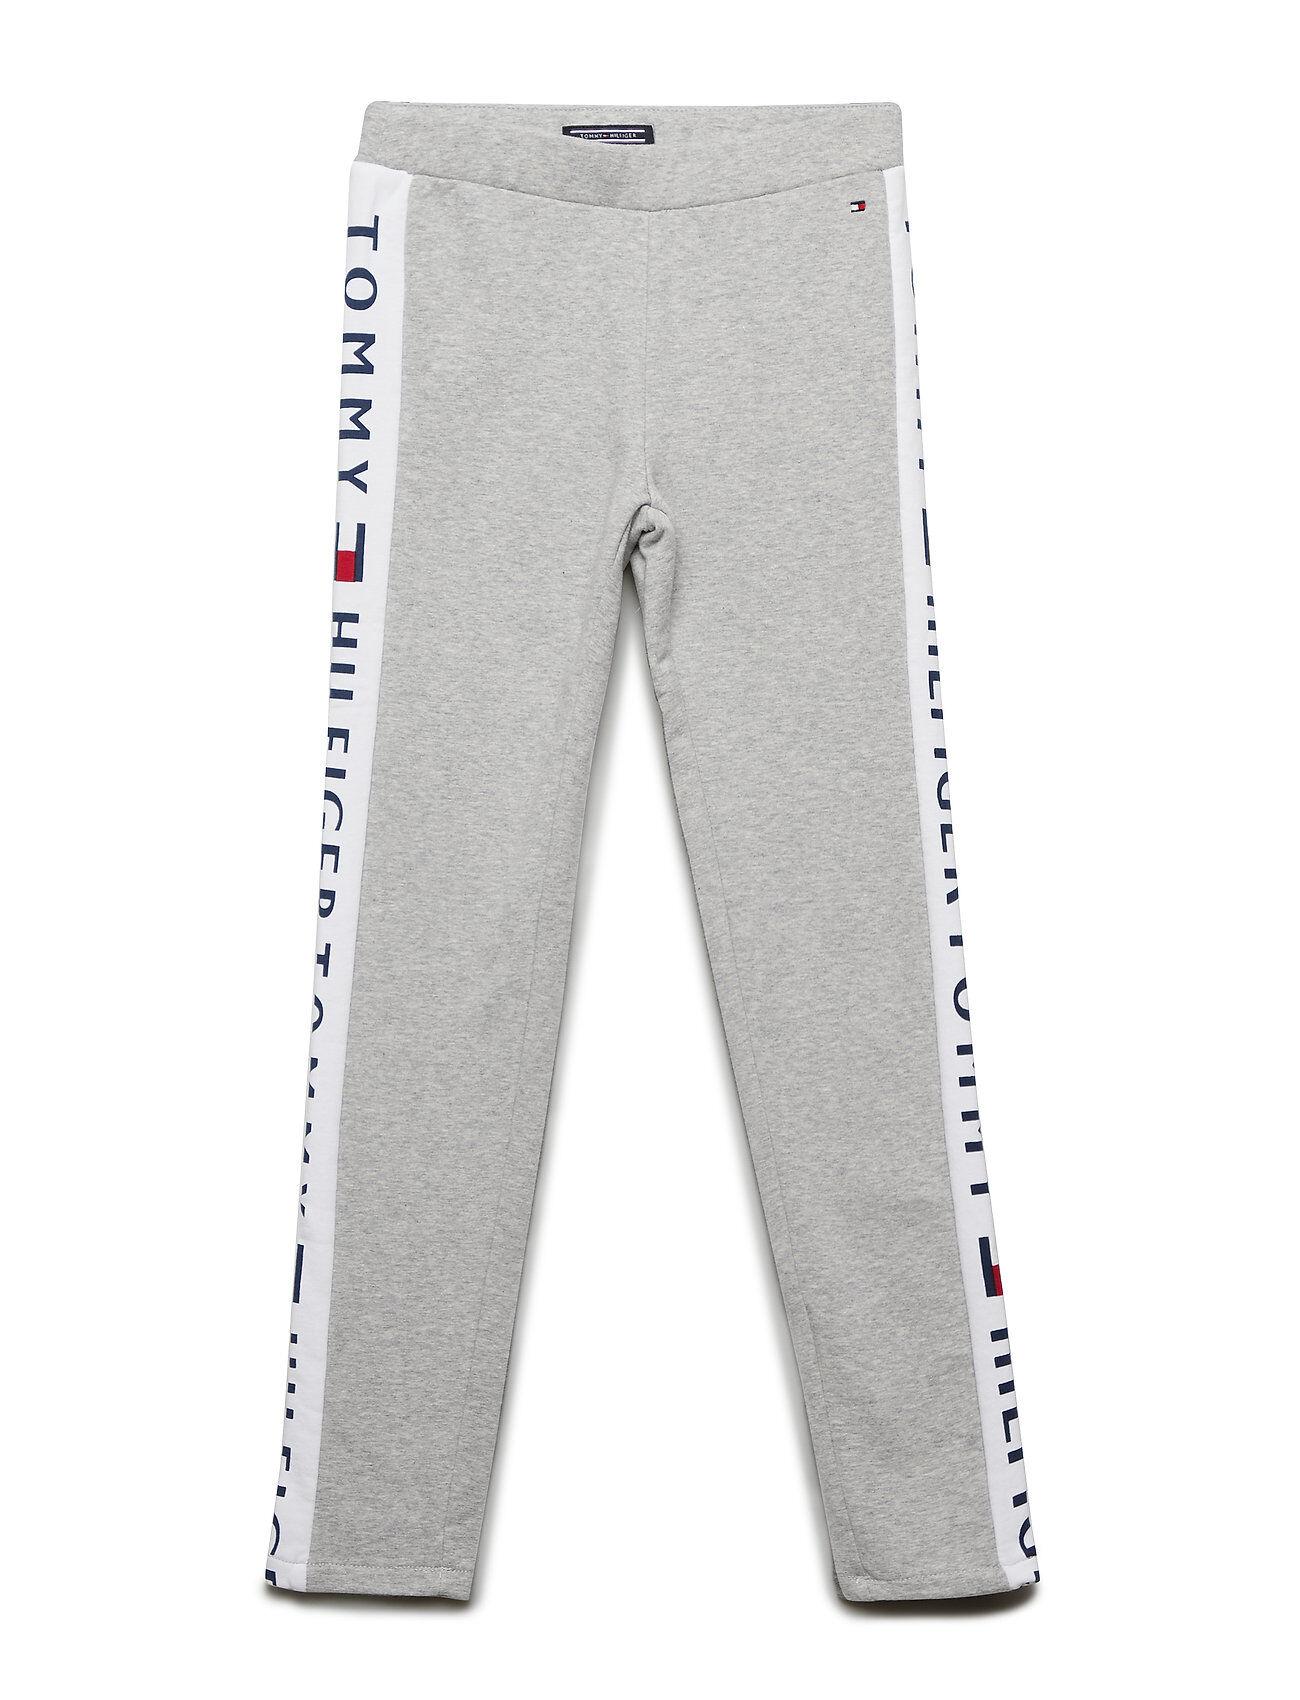 Tommy Hilfiger Brand Logo Leggings